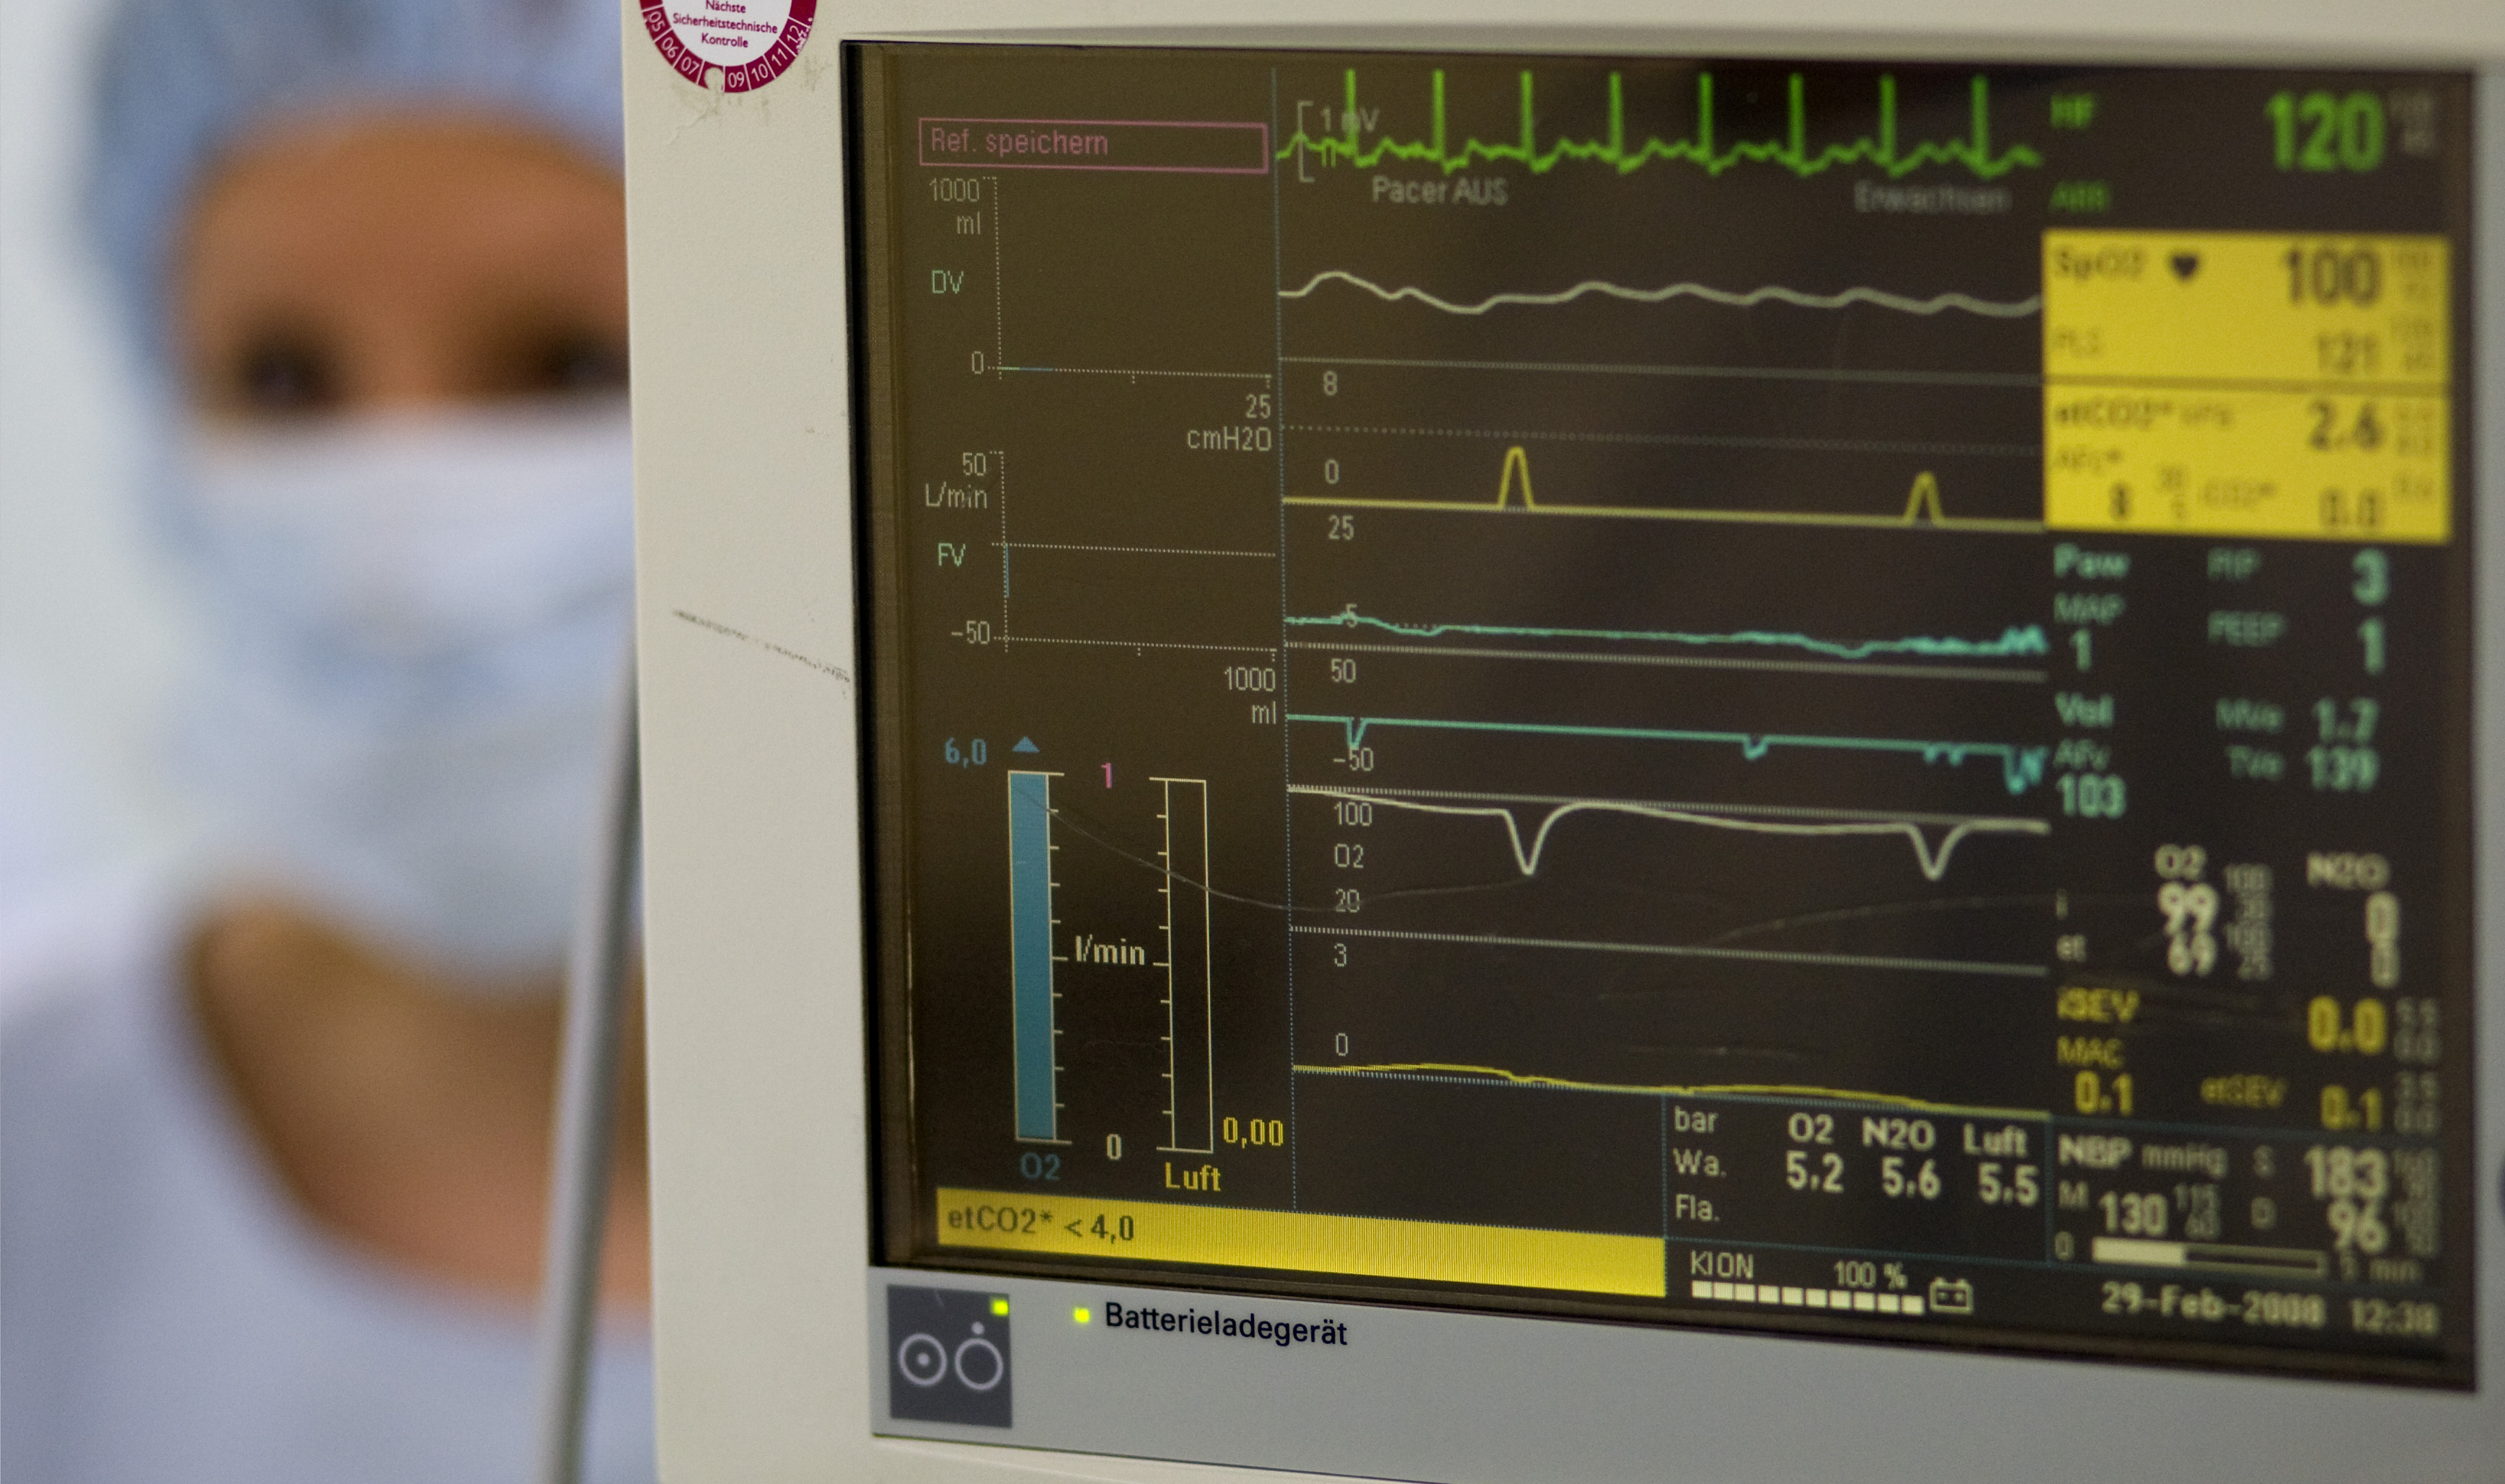 A surgery nurse beside a heart beat monitor in the operating theatre of the Unfallkrankenhaus Berlin (UKB) hospital in Berlin, February 29, 2008. REUTERS/Fabrizio Bensch